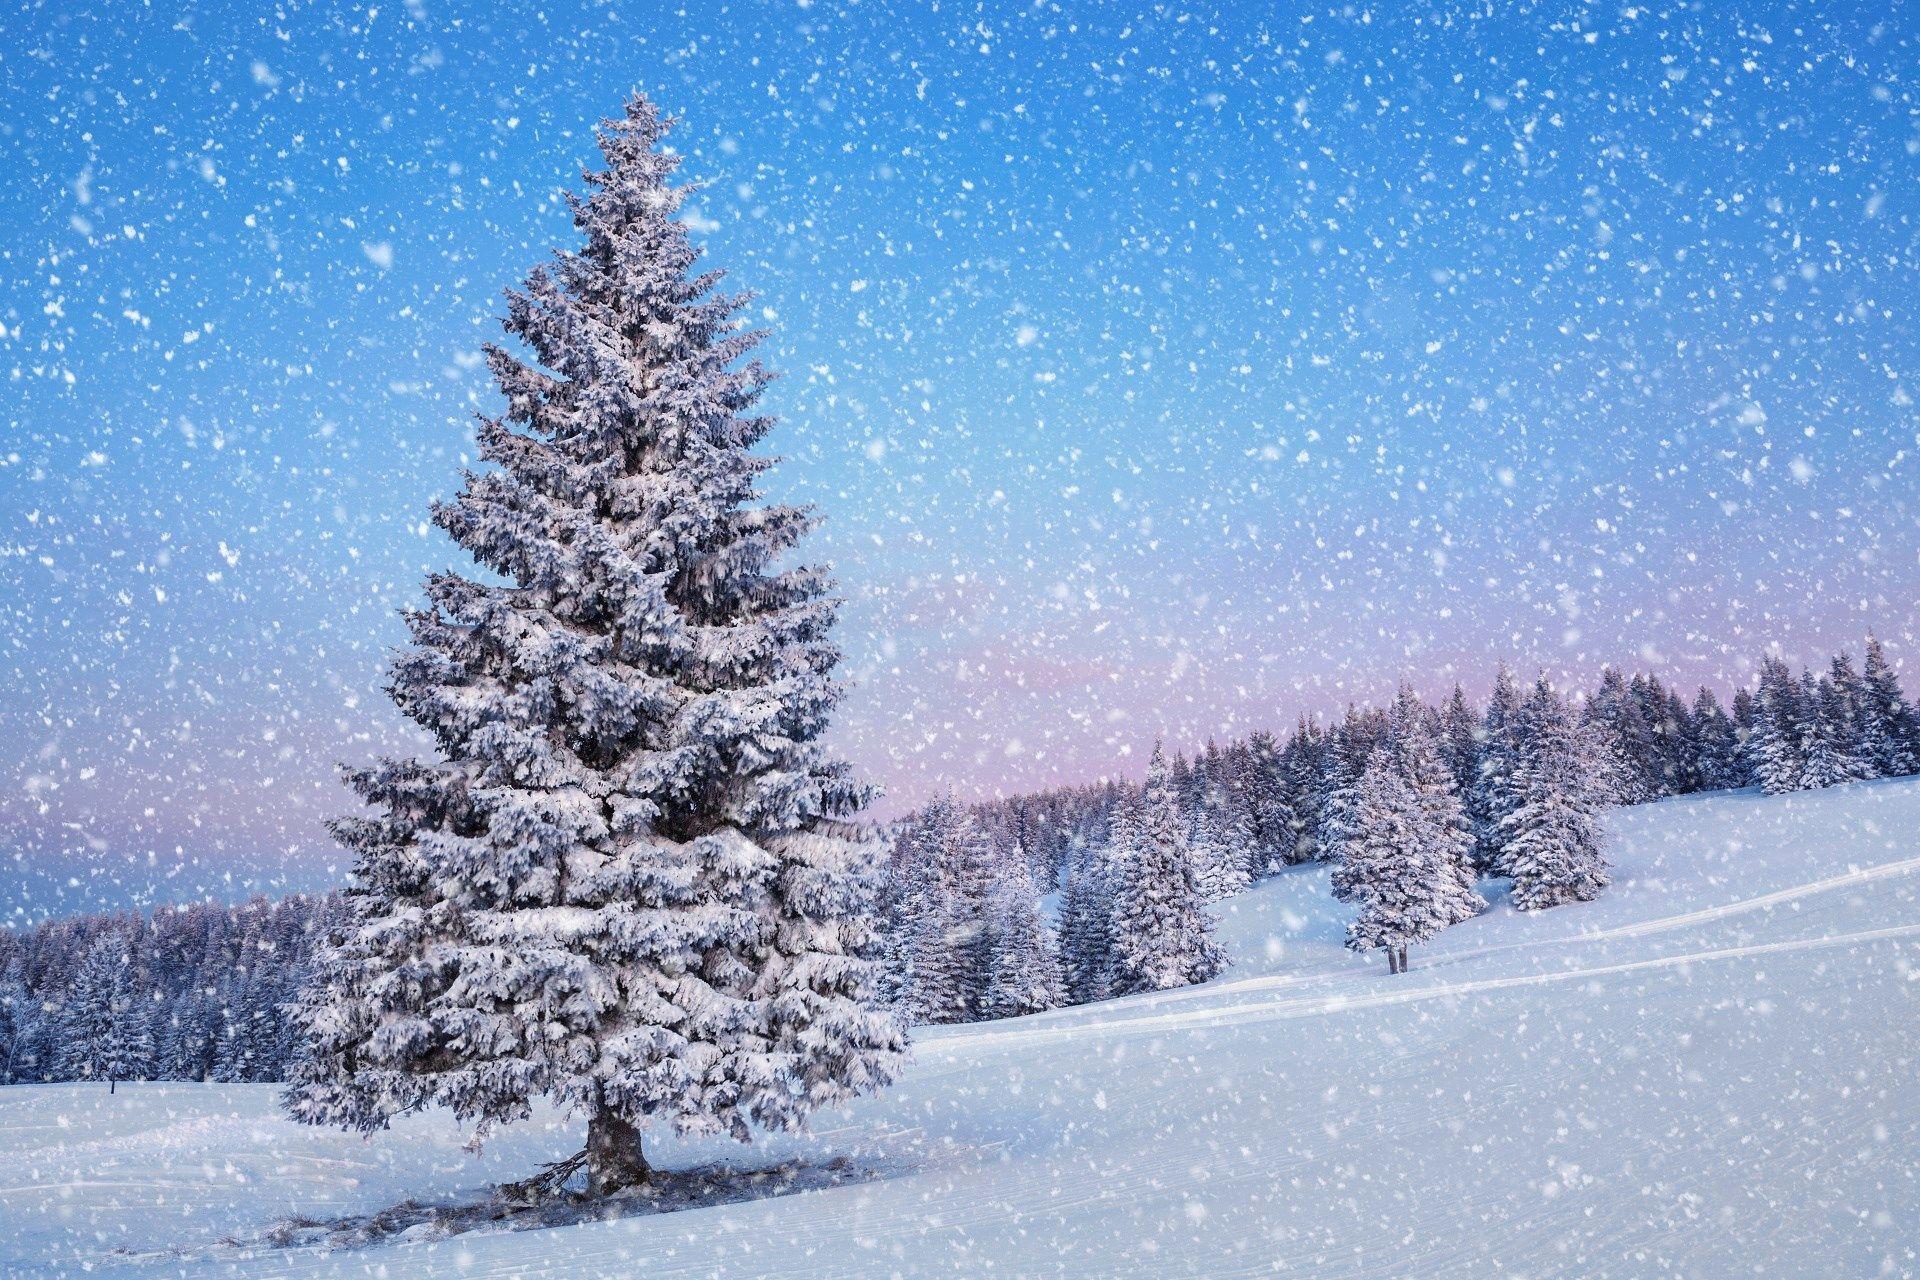 1920x1280 desktop background - winter | gogolmogol | pinterest